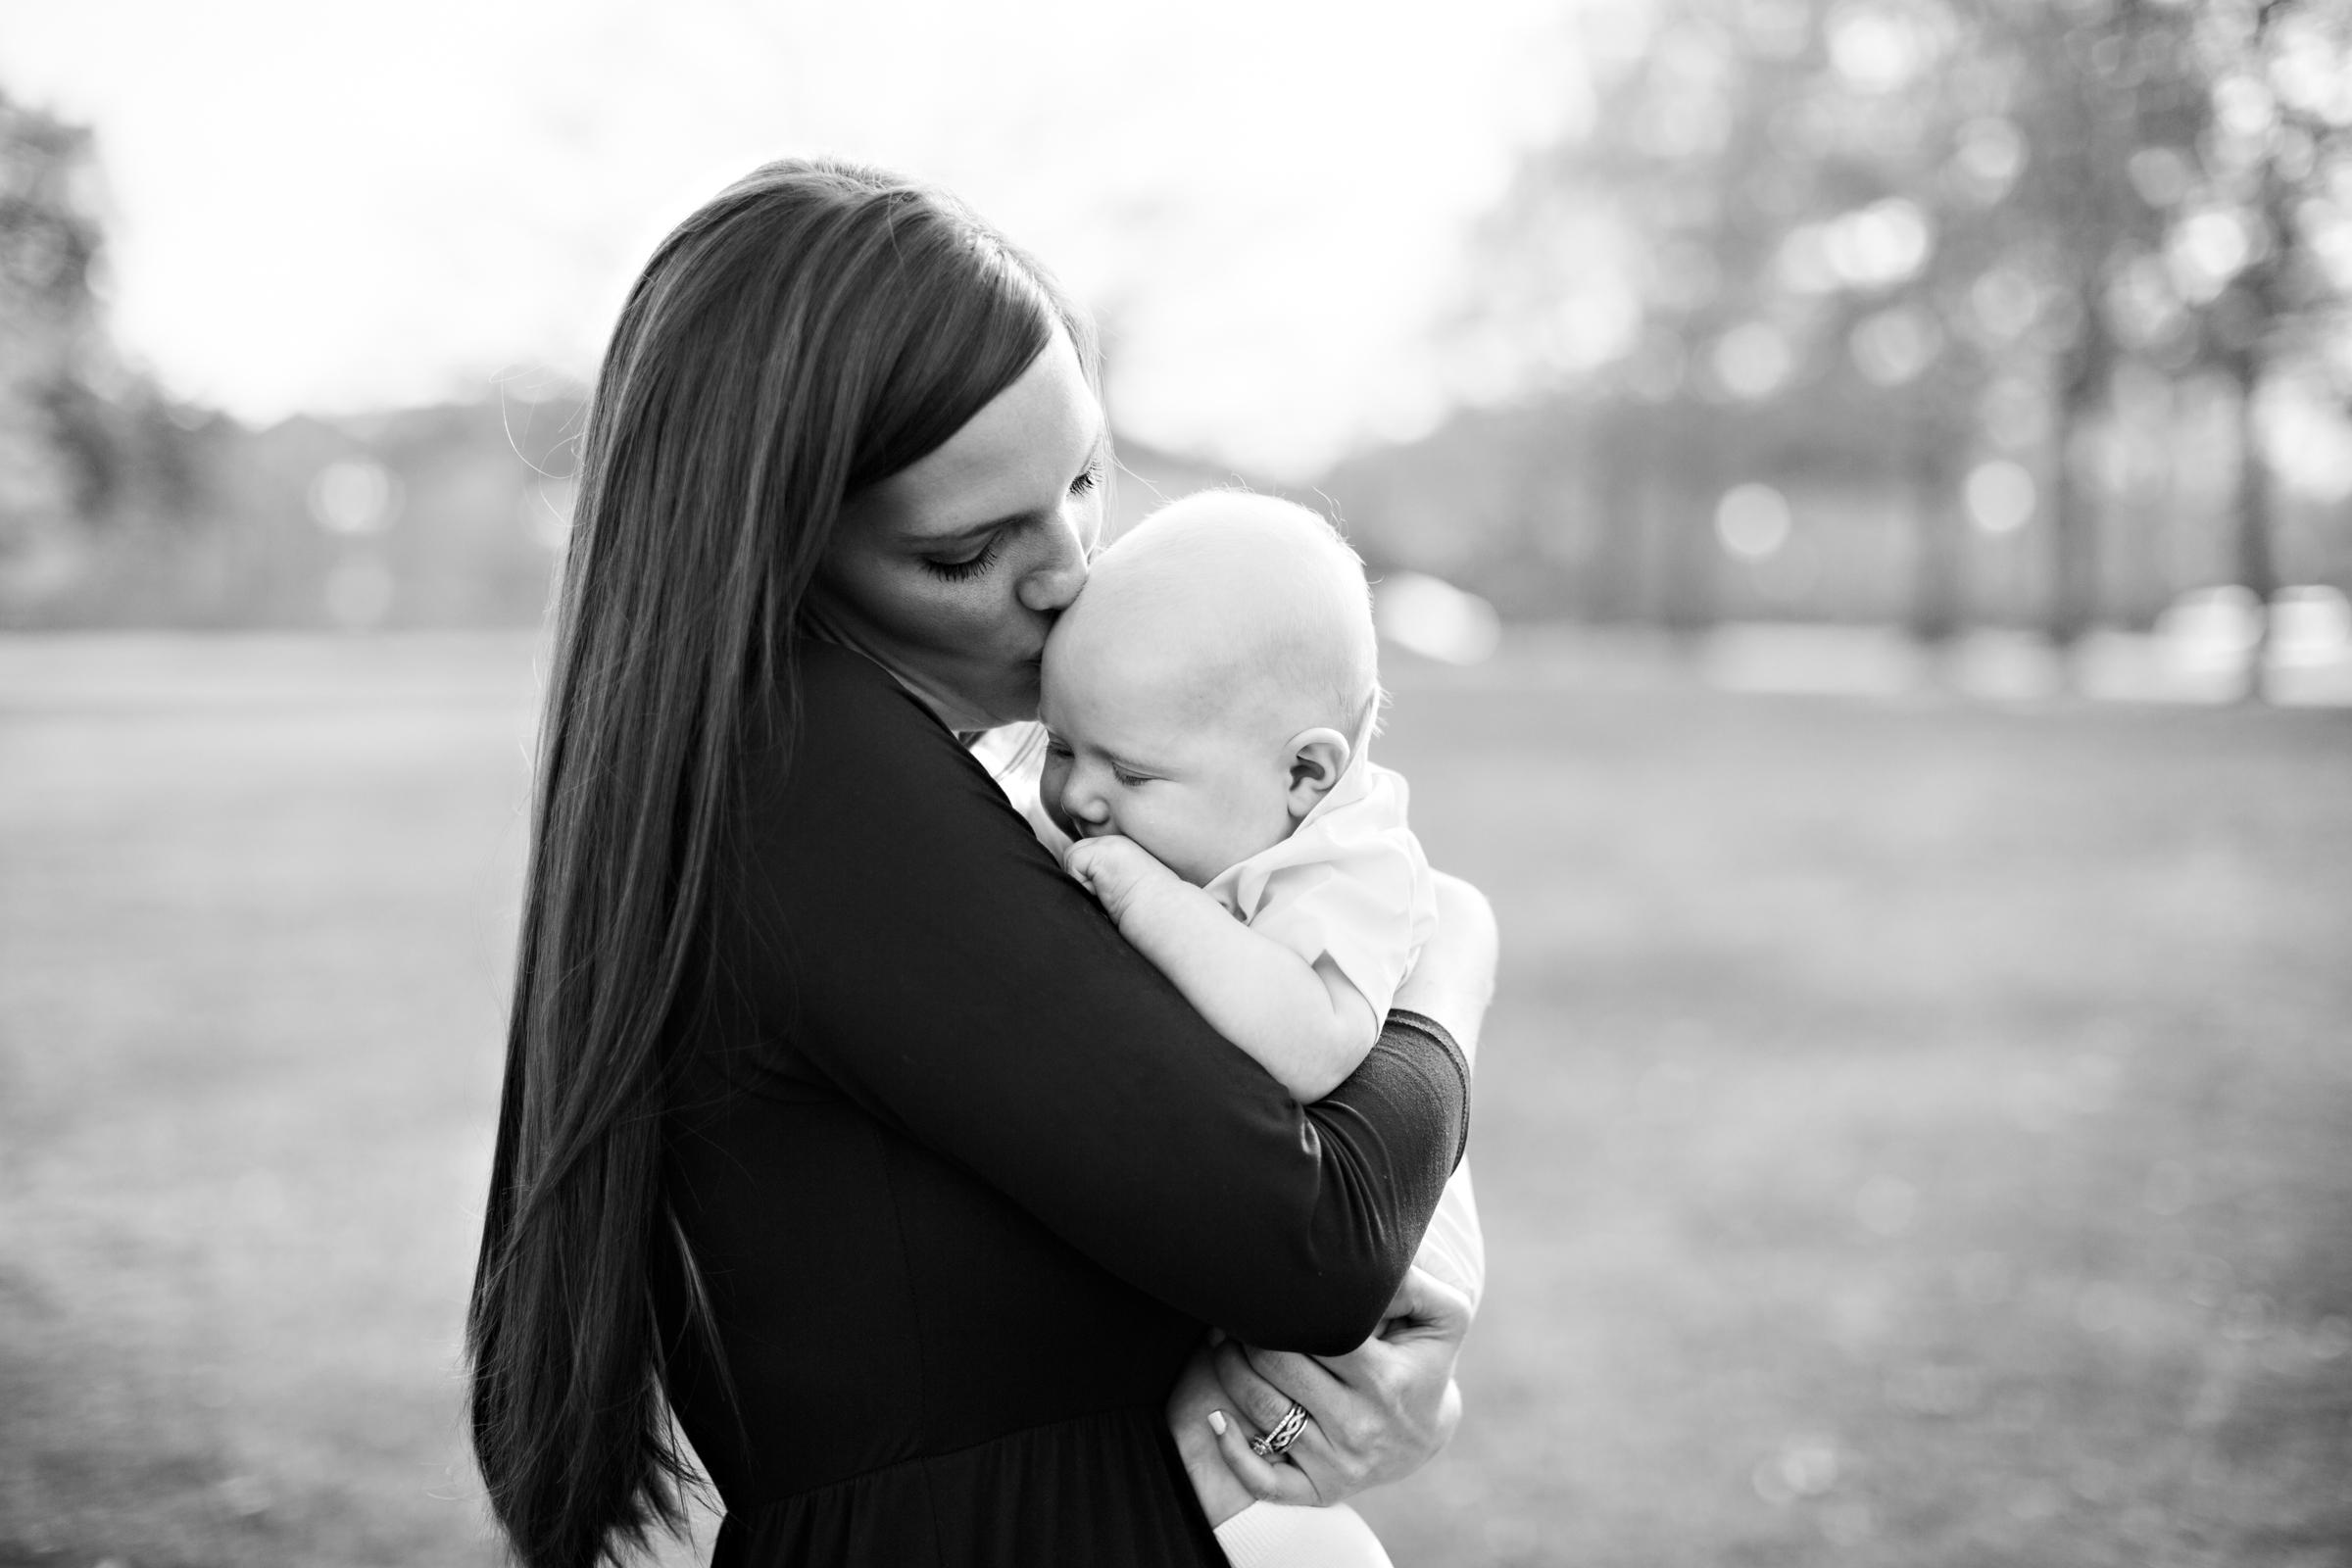 Montgomery-Photographers-Family-Nick-Drollette-Adam-Tiffany-6.jpg